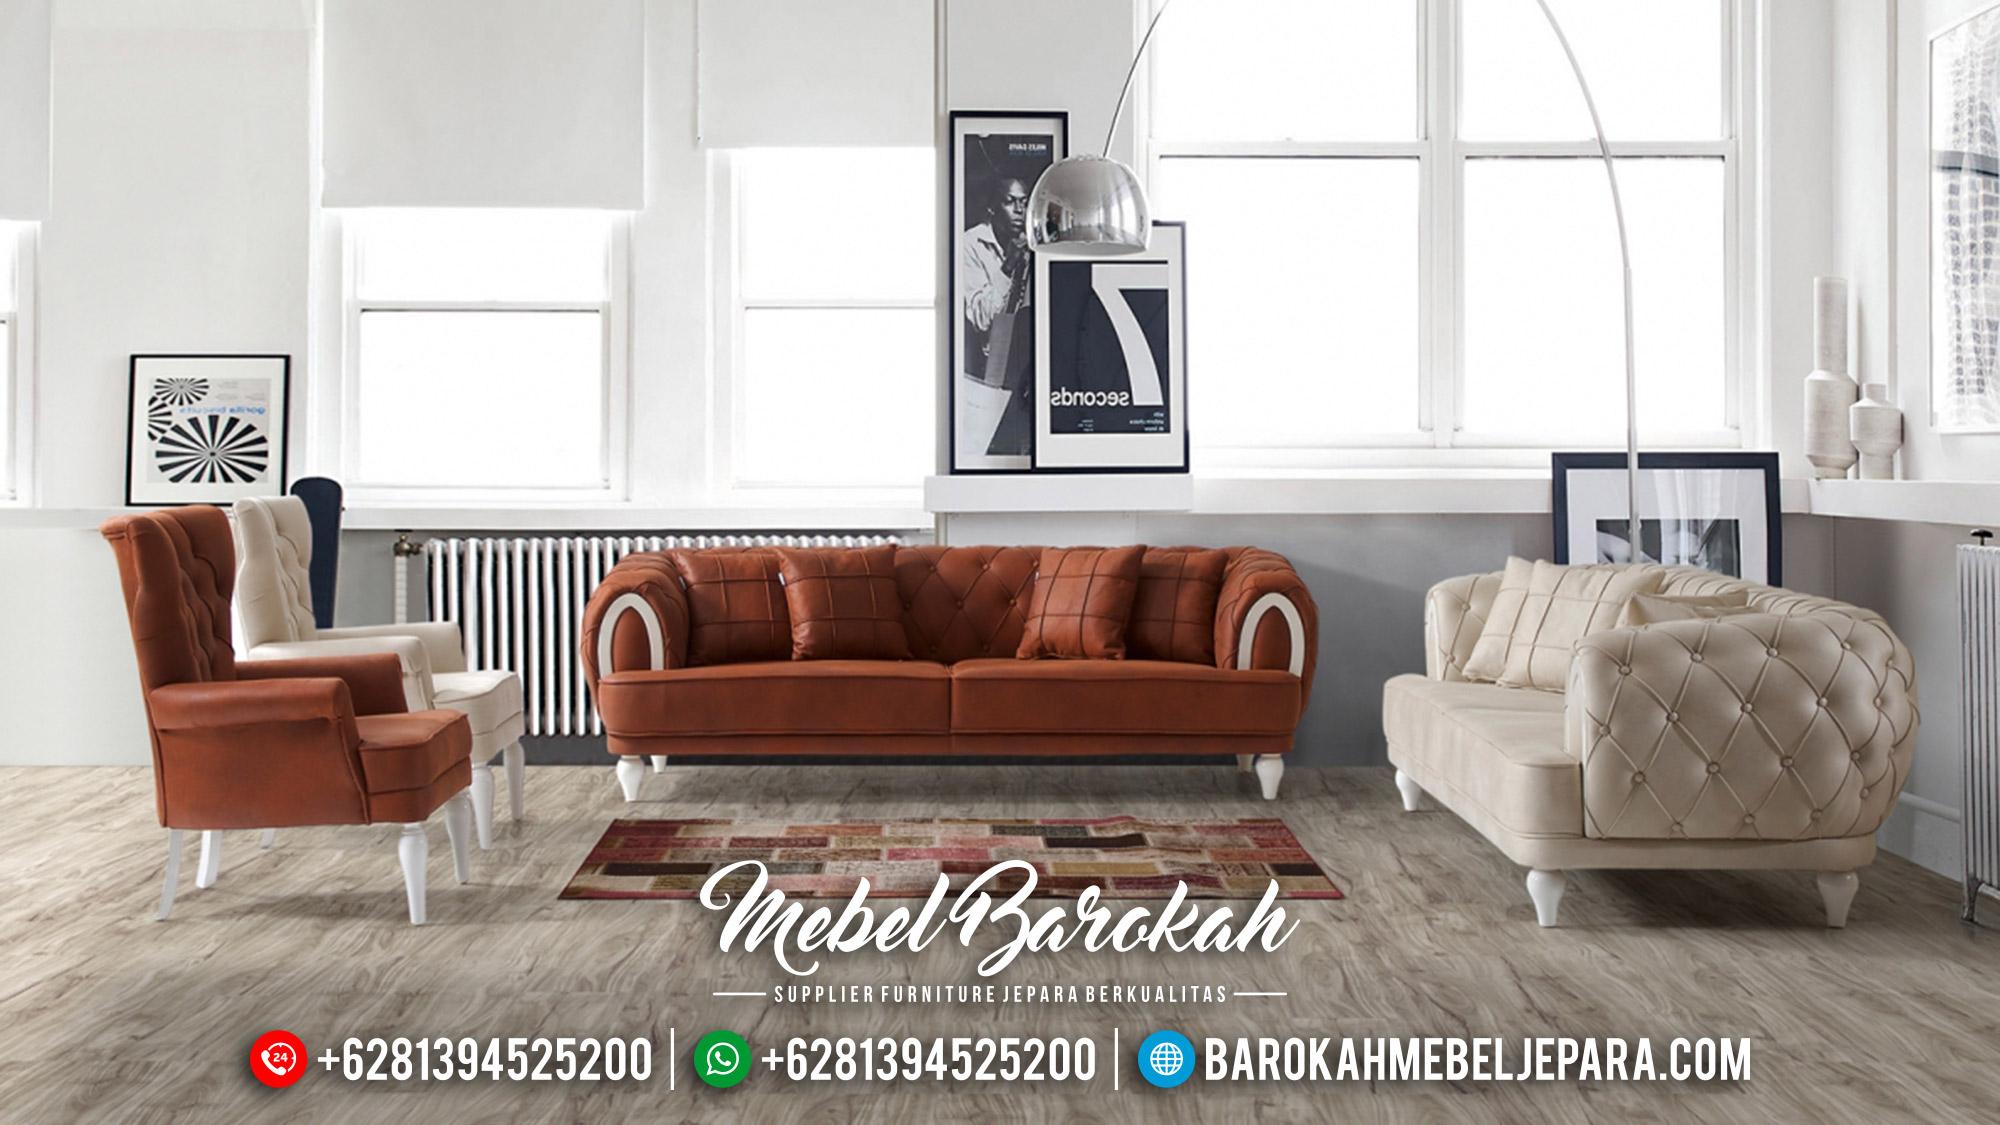 Desain Sofa Tamu Minimalis Modern Model Shabby Design Interior Inspiring MB-0532